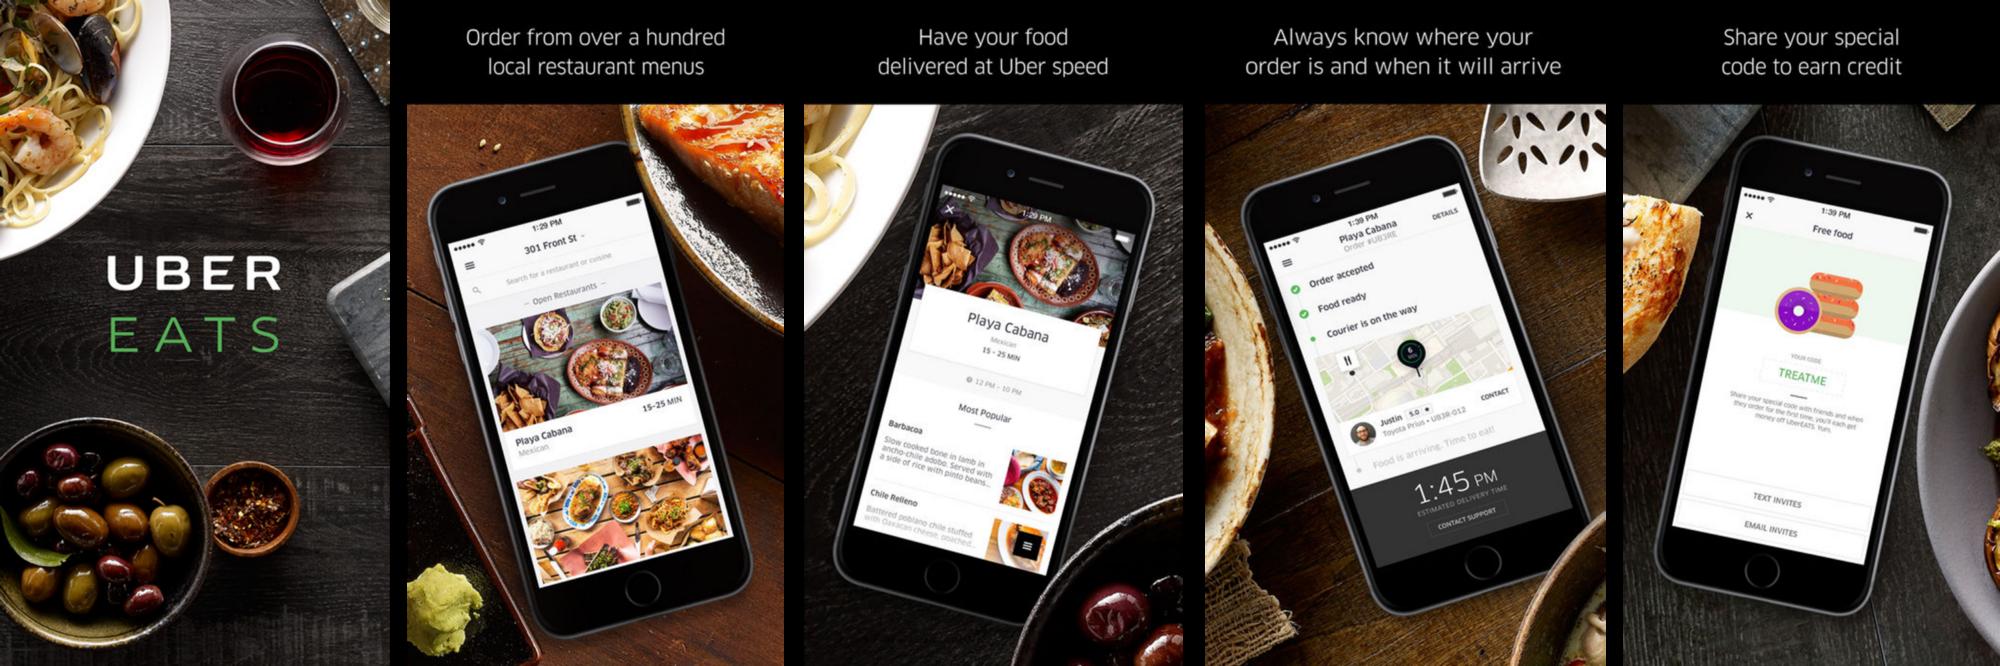 Uber Eats App Store Screenshots App store, Store image, App